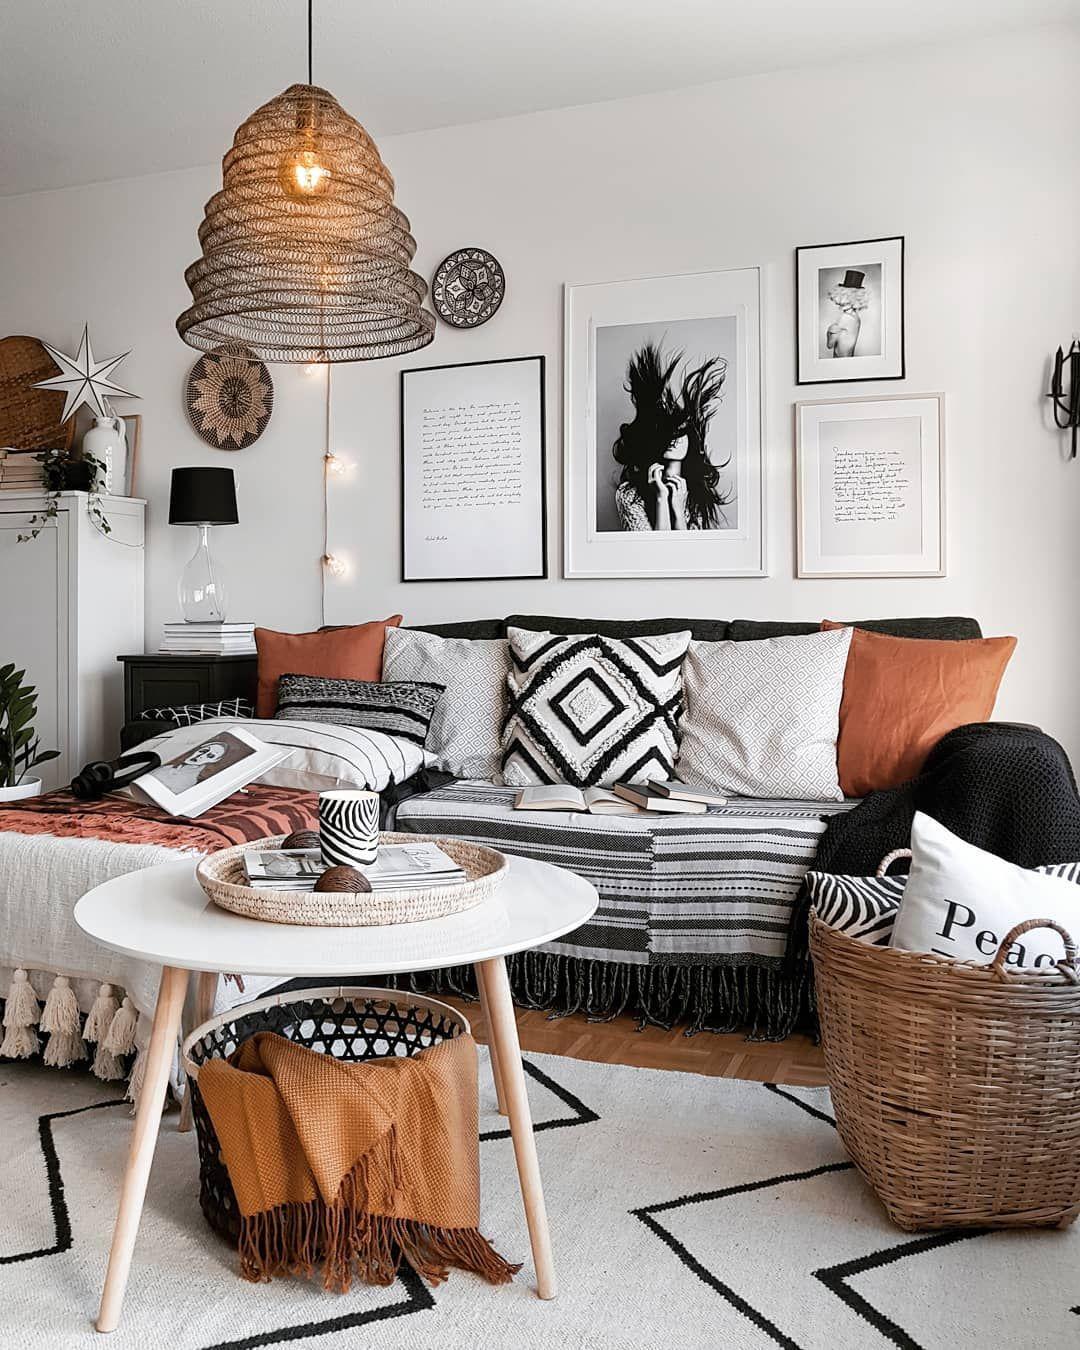 Provenance De La Photo Instagram Mk Nordic Interiordesign Interiors Design Deco Skandin In 2020 Living Room Ideas 2019 Beautiful Living Rooms Boho Living Room